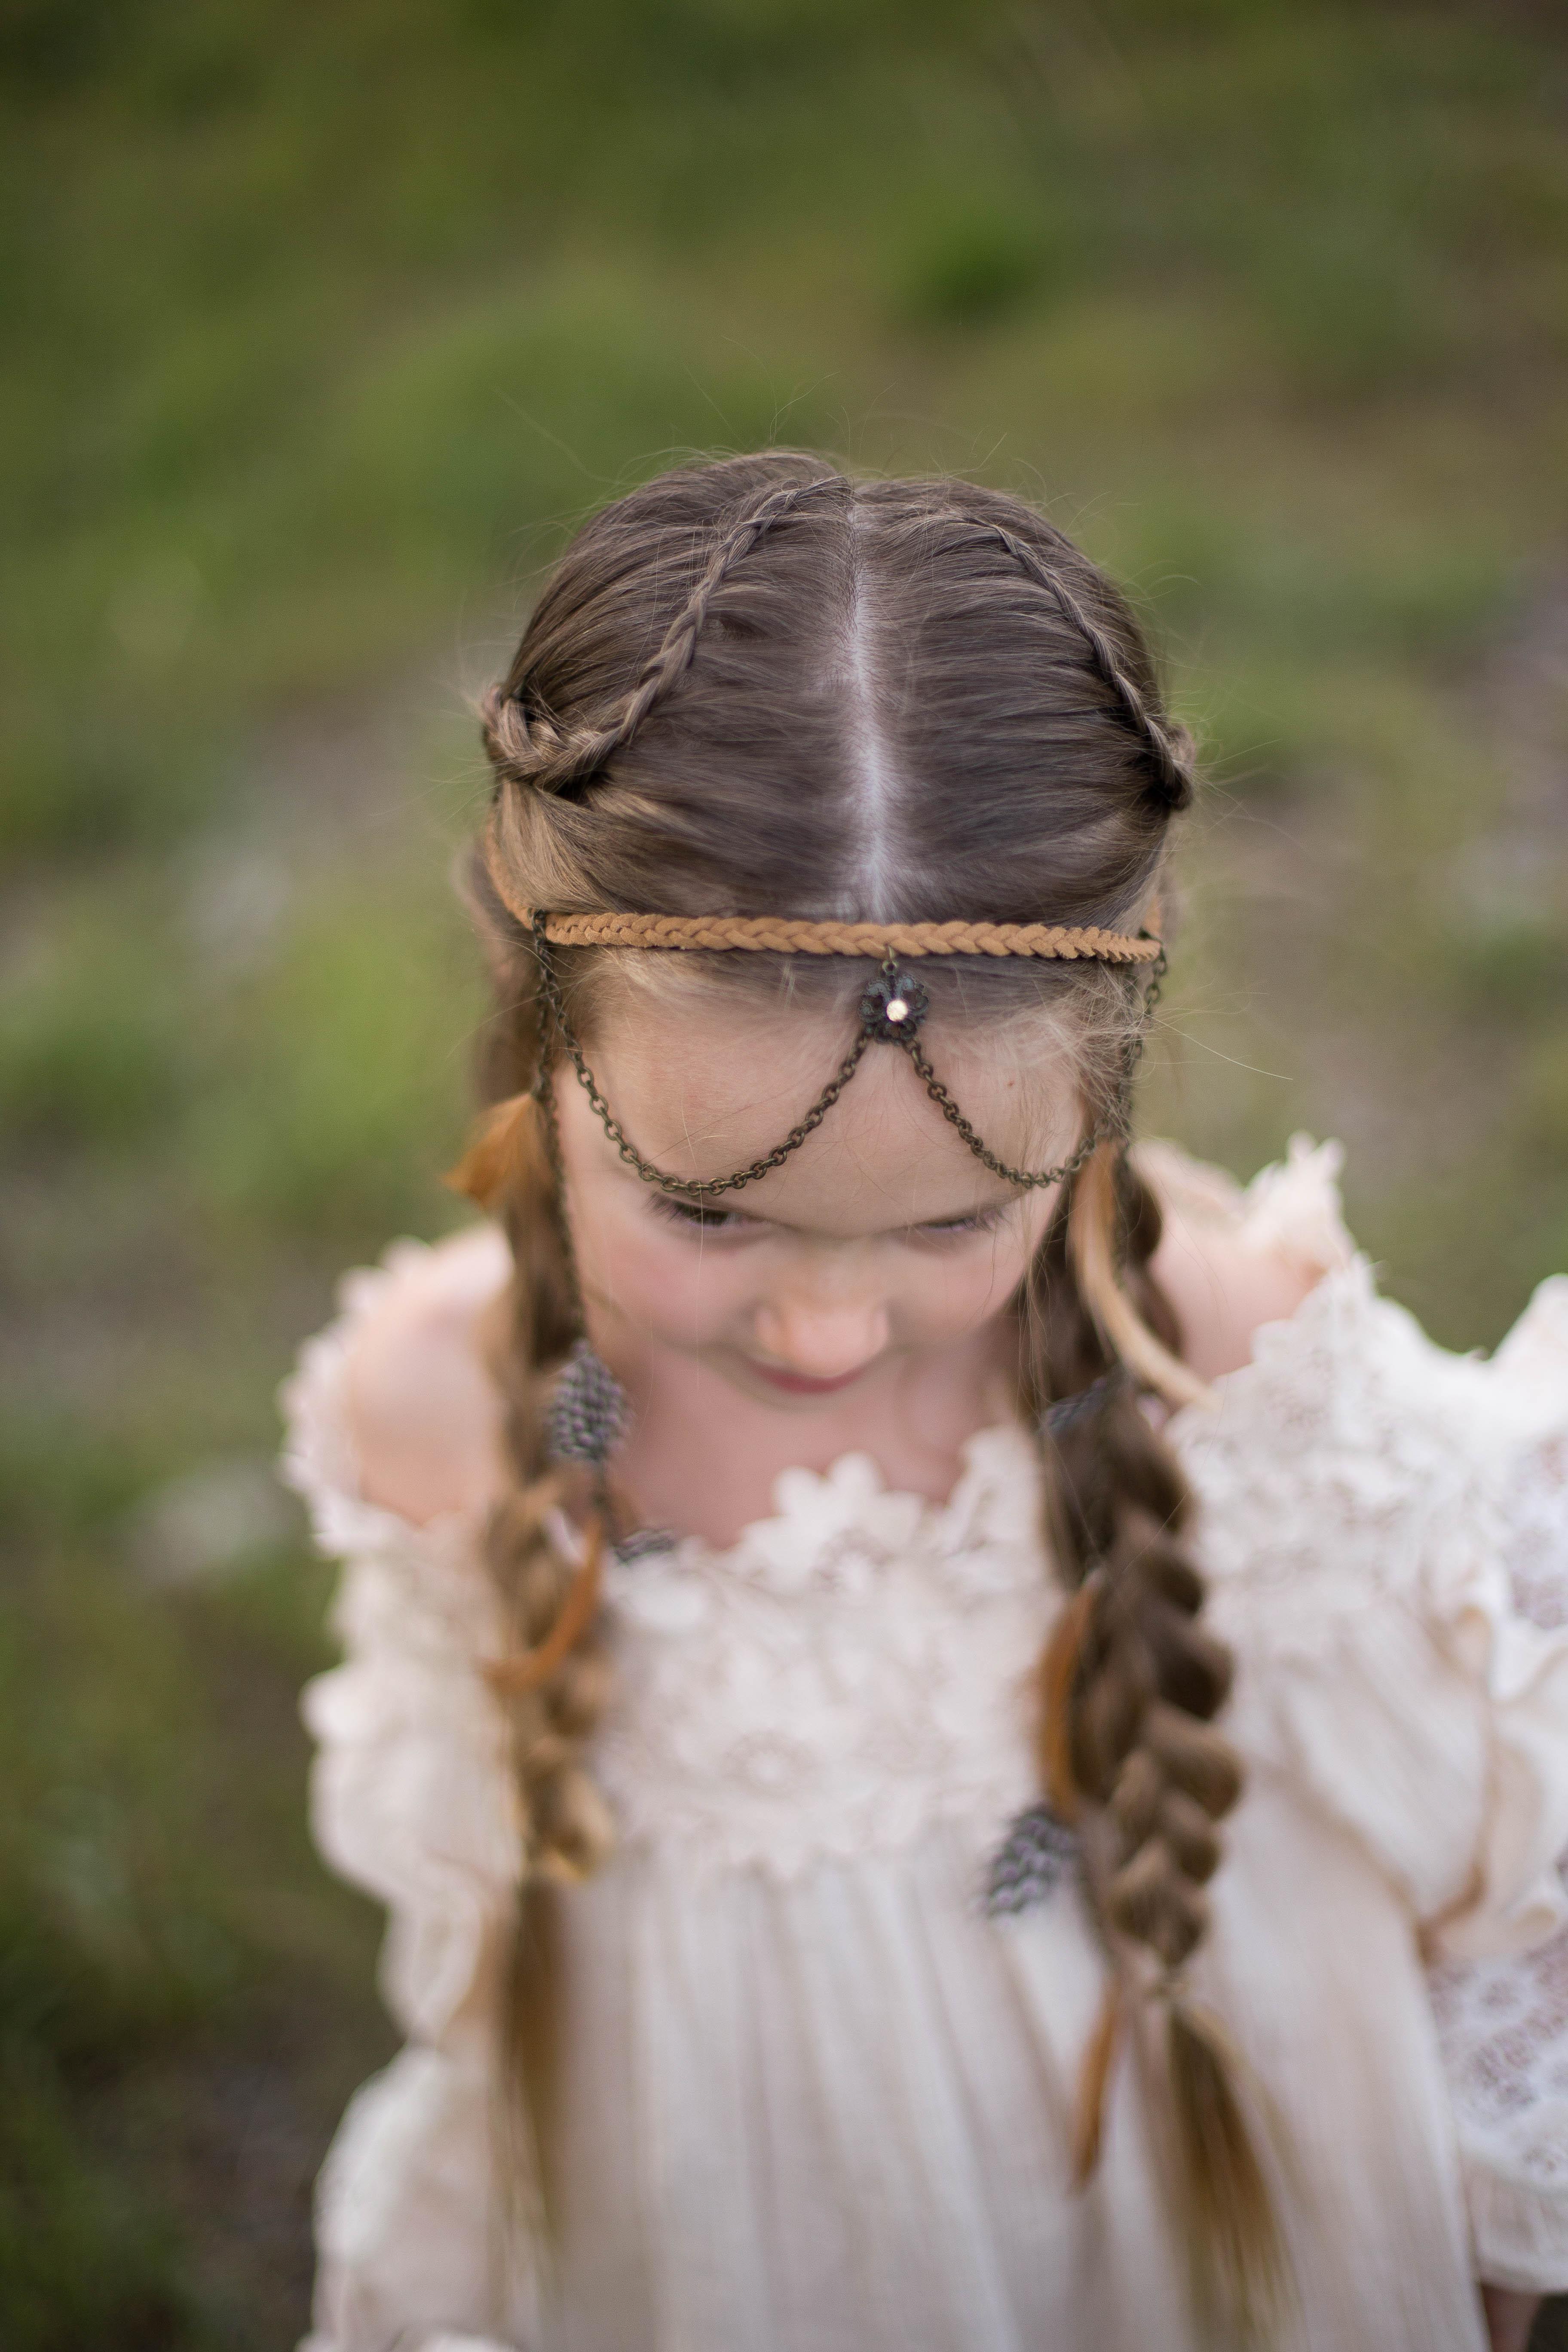 Boho Side Braids - Cute Girls Hairstyles